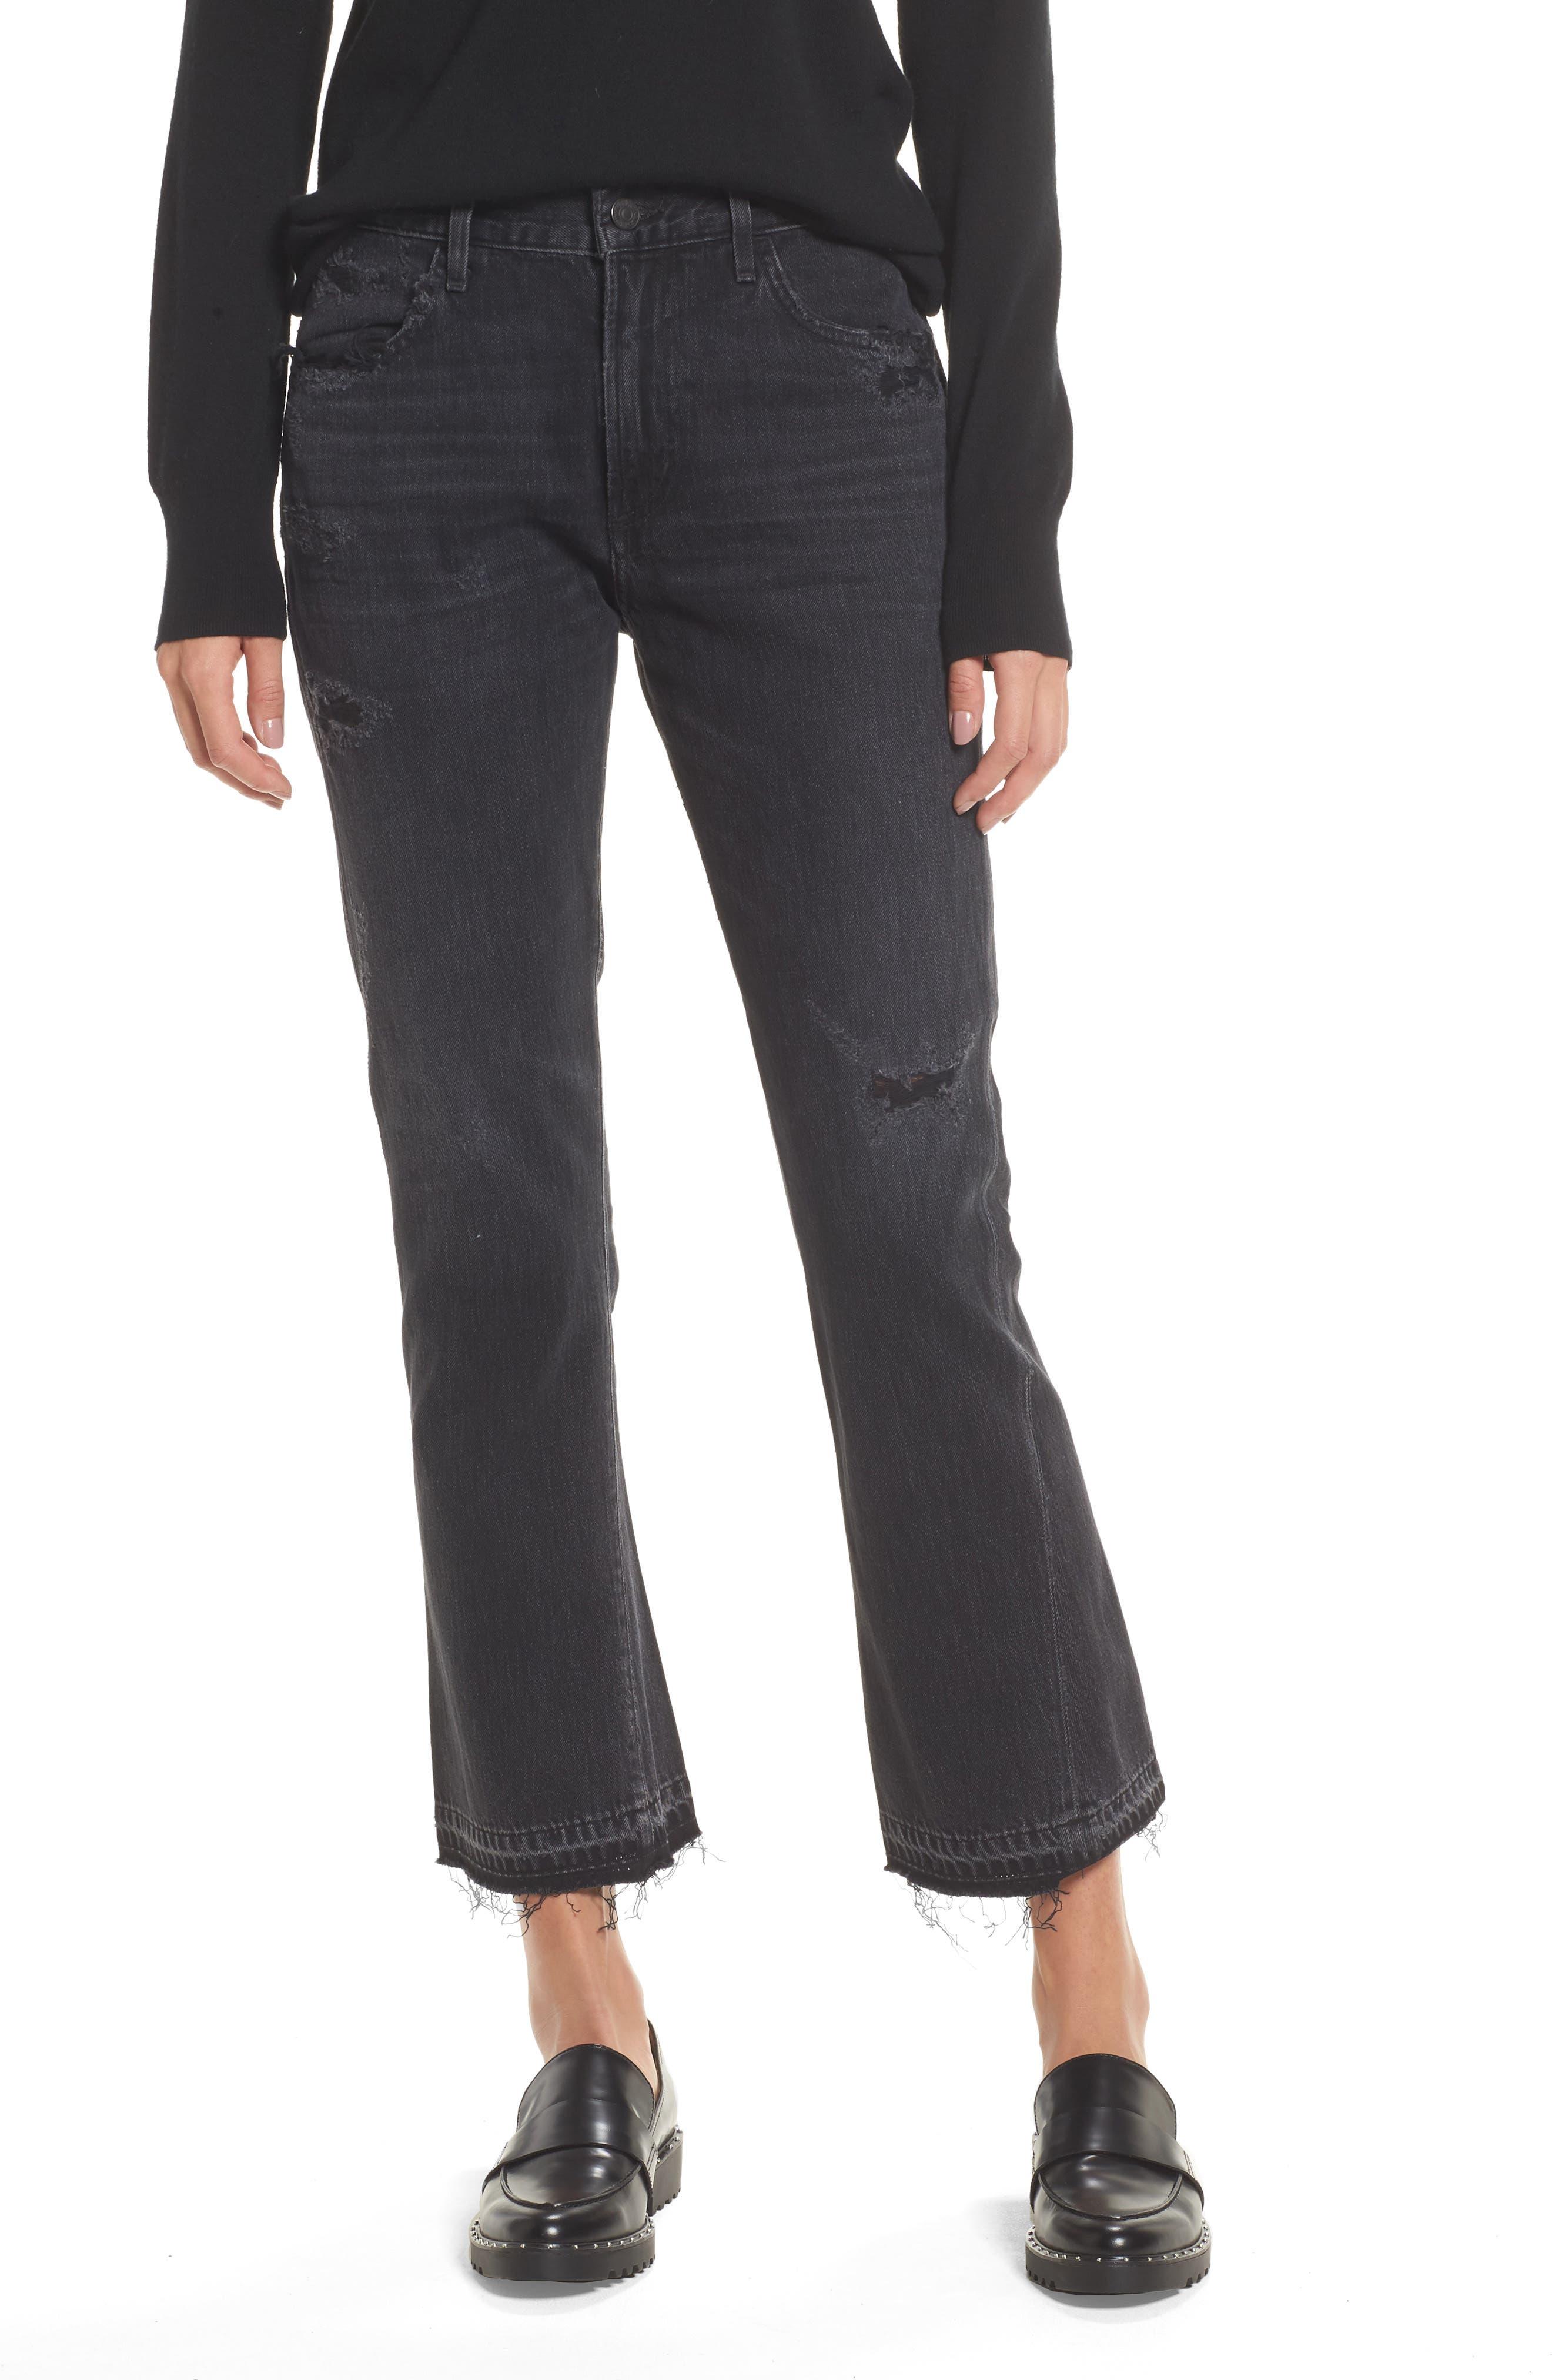 Alternate Image 1 Selected - Citizens of Humanity Sasha Twist Crop Jeans (Black Hawk)